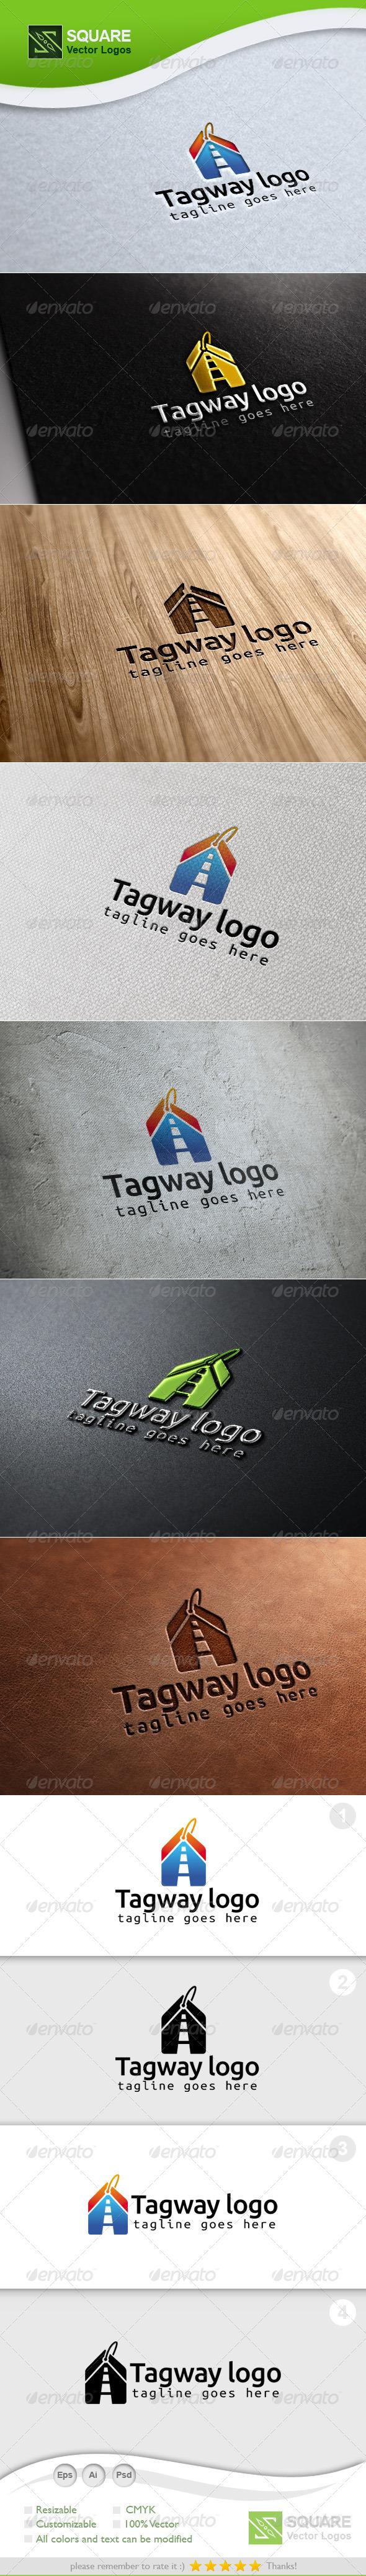 GraphicRiver Tag Way Vector Logo Template 6878298